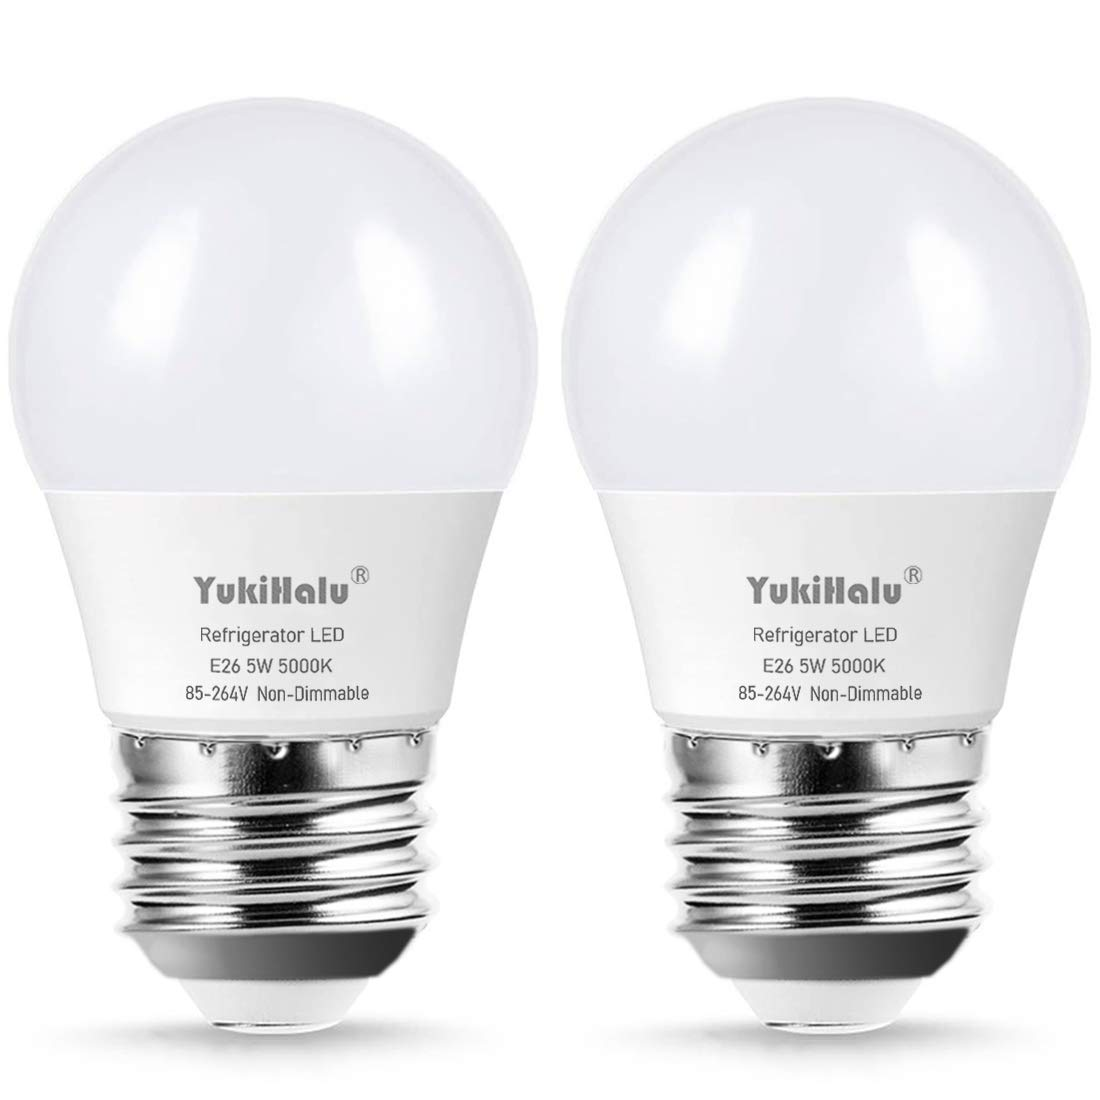 LED Refrigerator Light Bulb 40W Equivalent A15 Appliance Fridge Bulbs, Waterproof, 450 Lumen 5W Daylight 5000K E26 Medium Base, Small Size Bulb, for Damp Location, Not Dimmable, 2-Pack